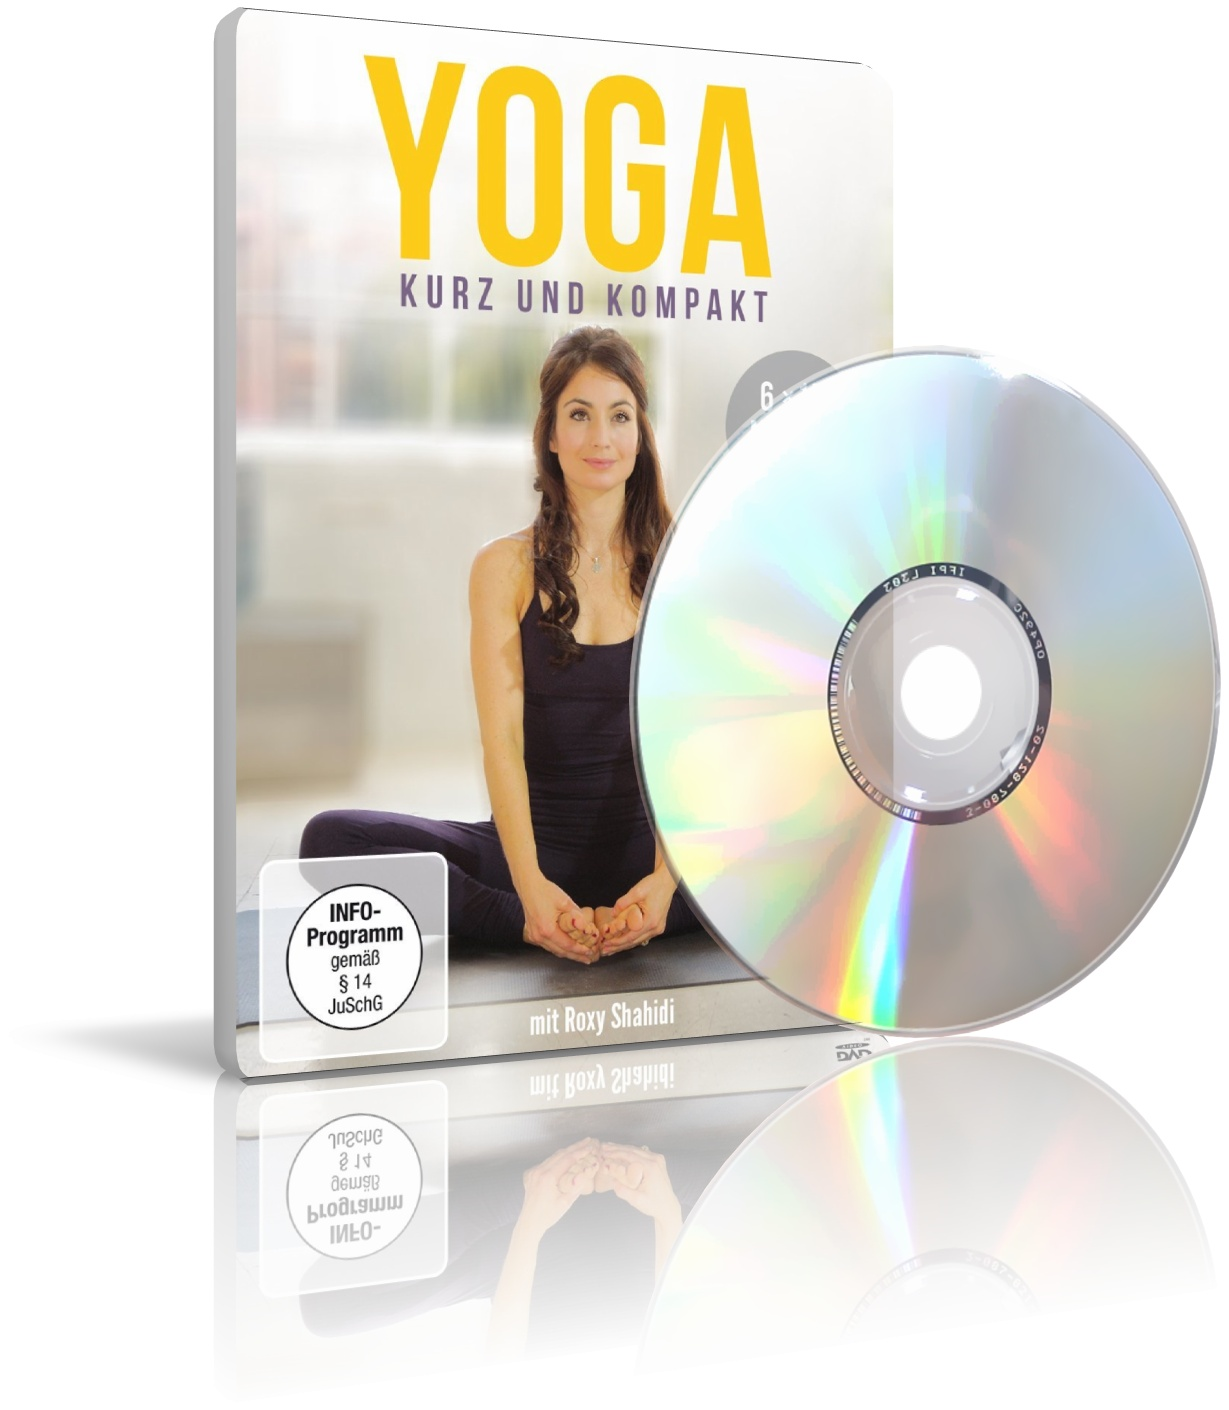 Yoga kurz und kompakt mit Roxy Shahidi (DVD)